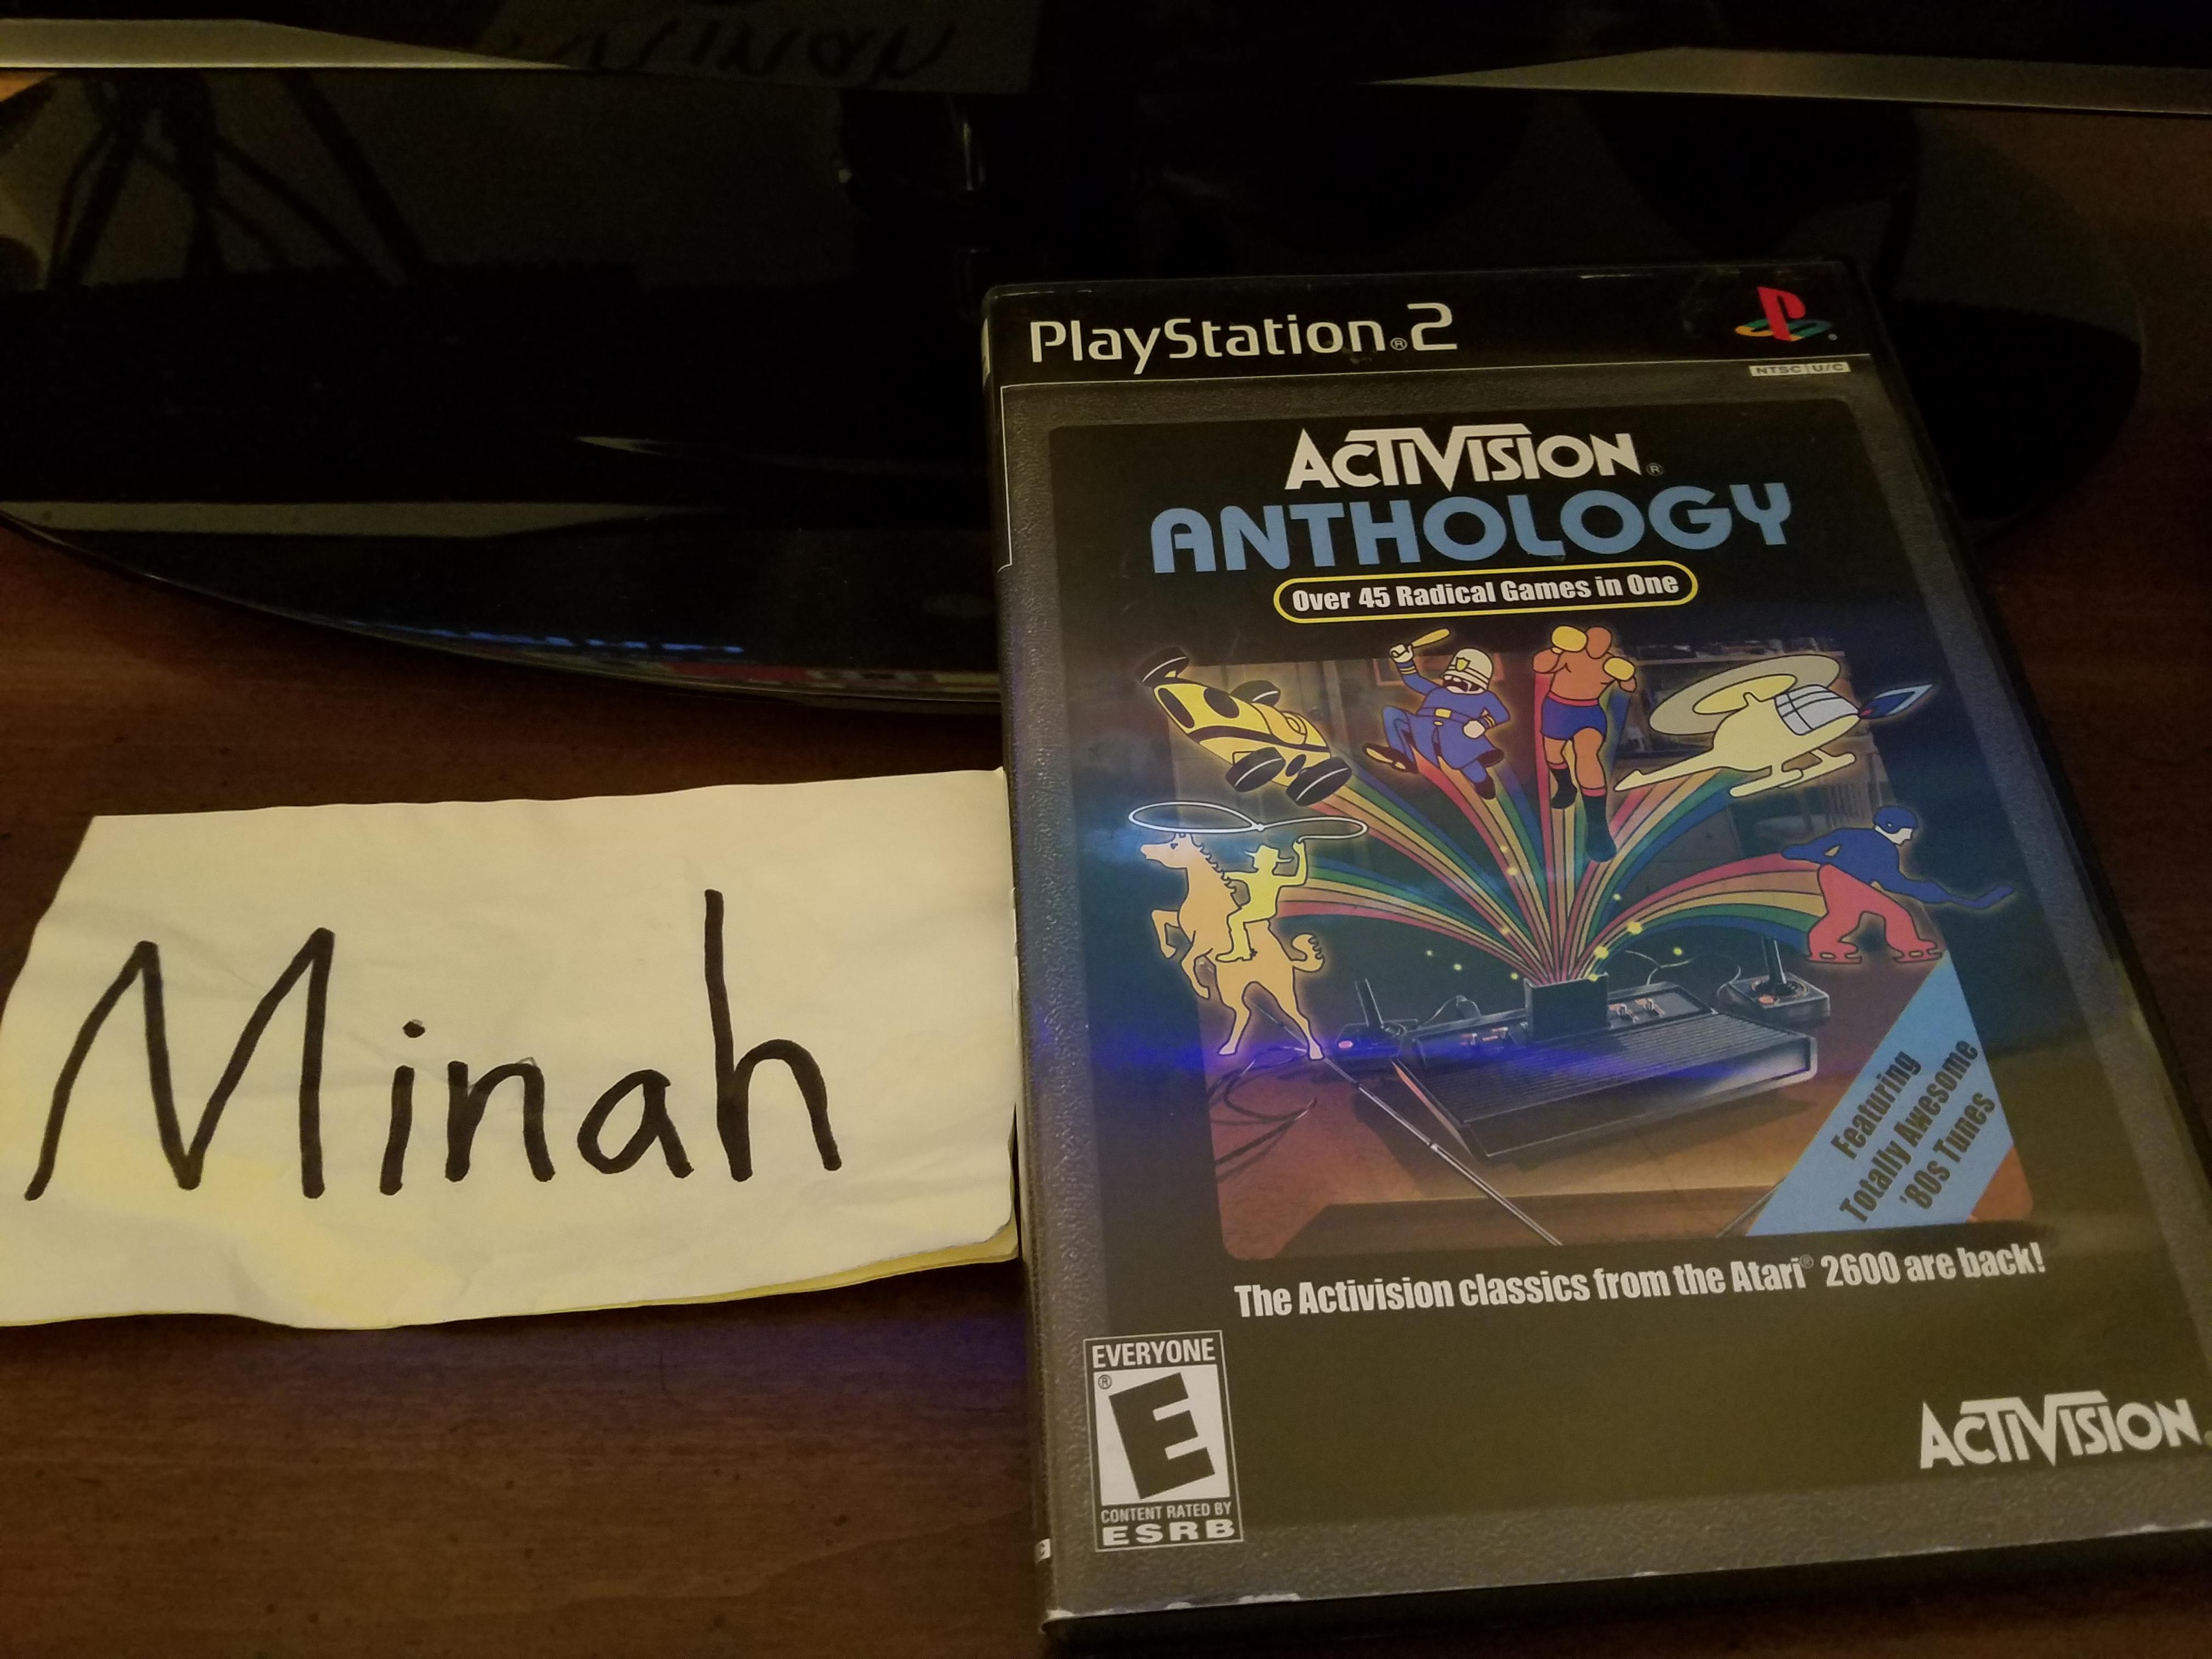 minah: Activision Anthology: Enduro [Game 1B] (Playstation 2) 574 points on 2017-01-18 18:56:23